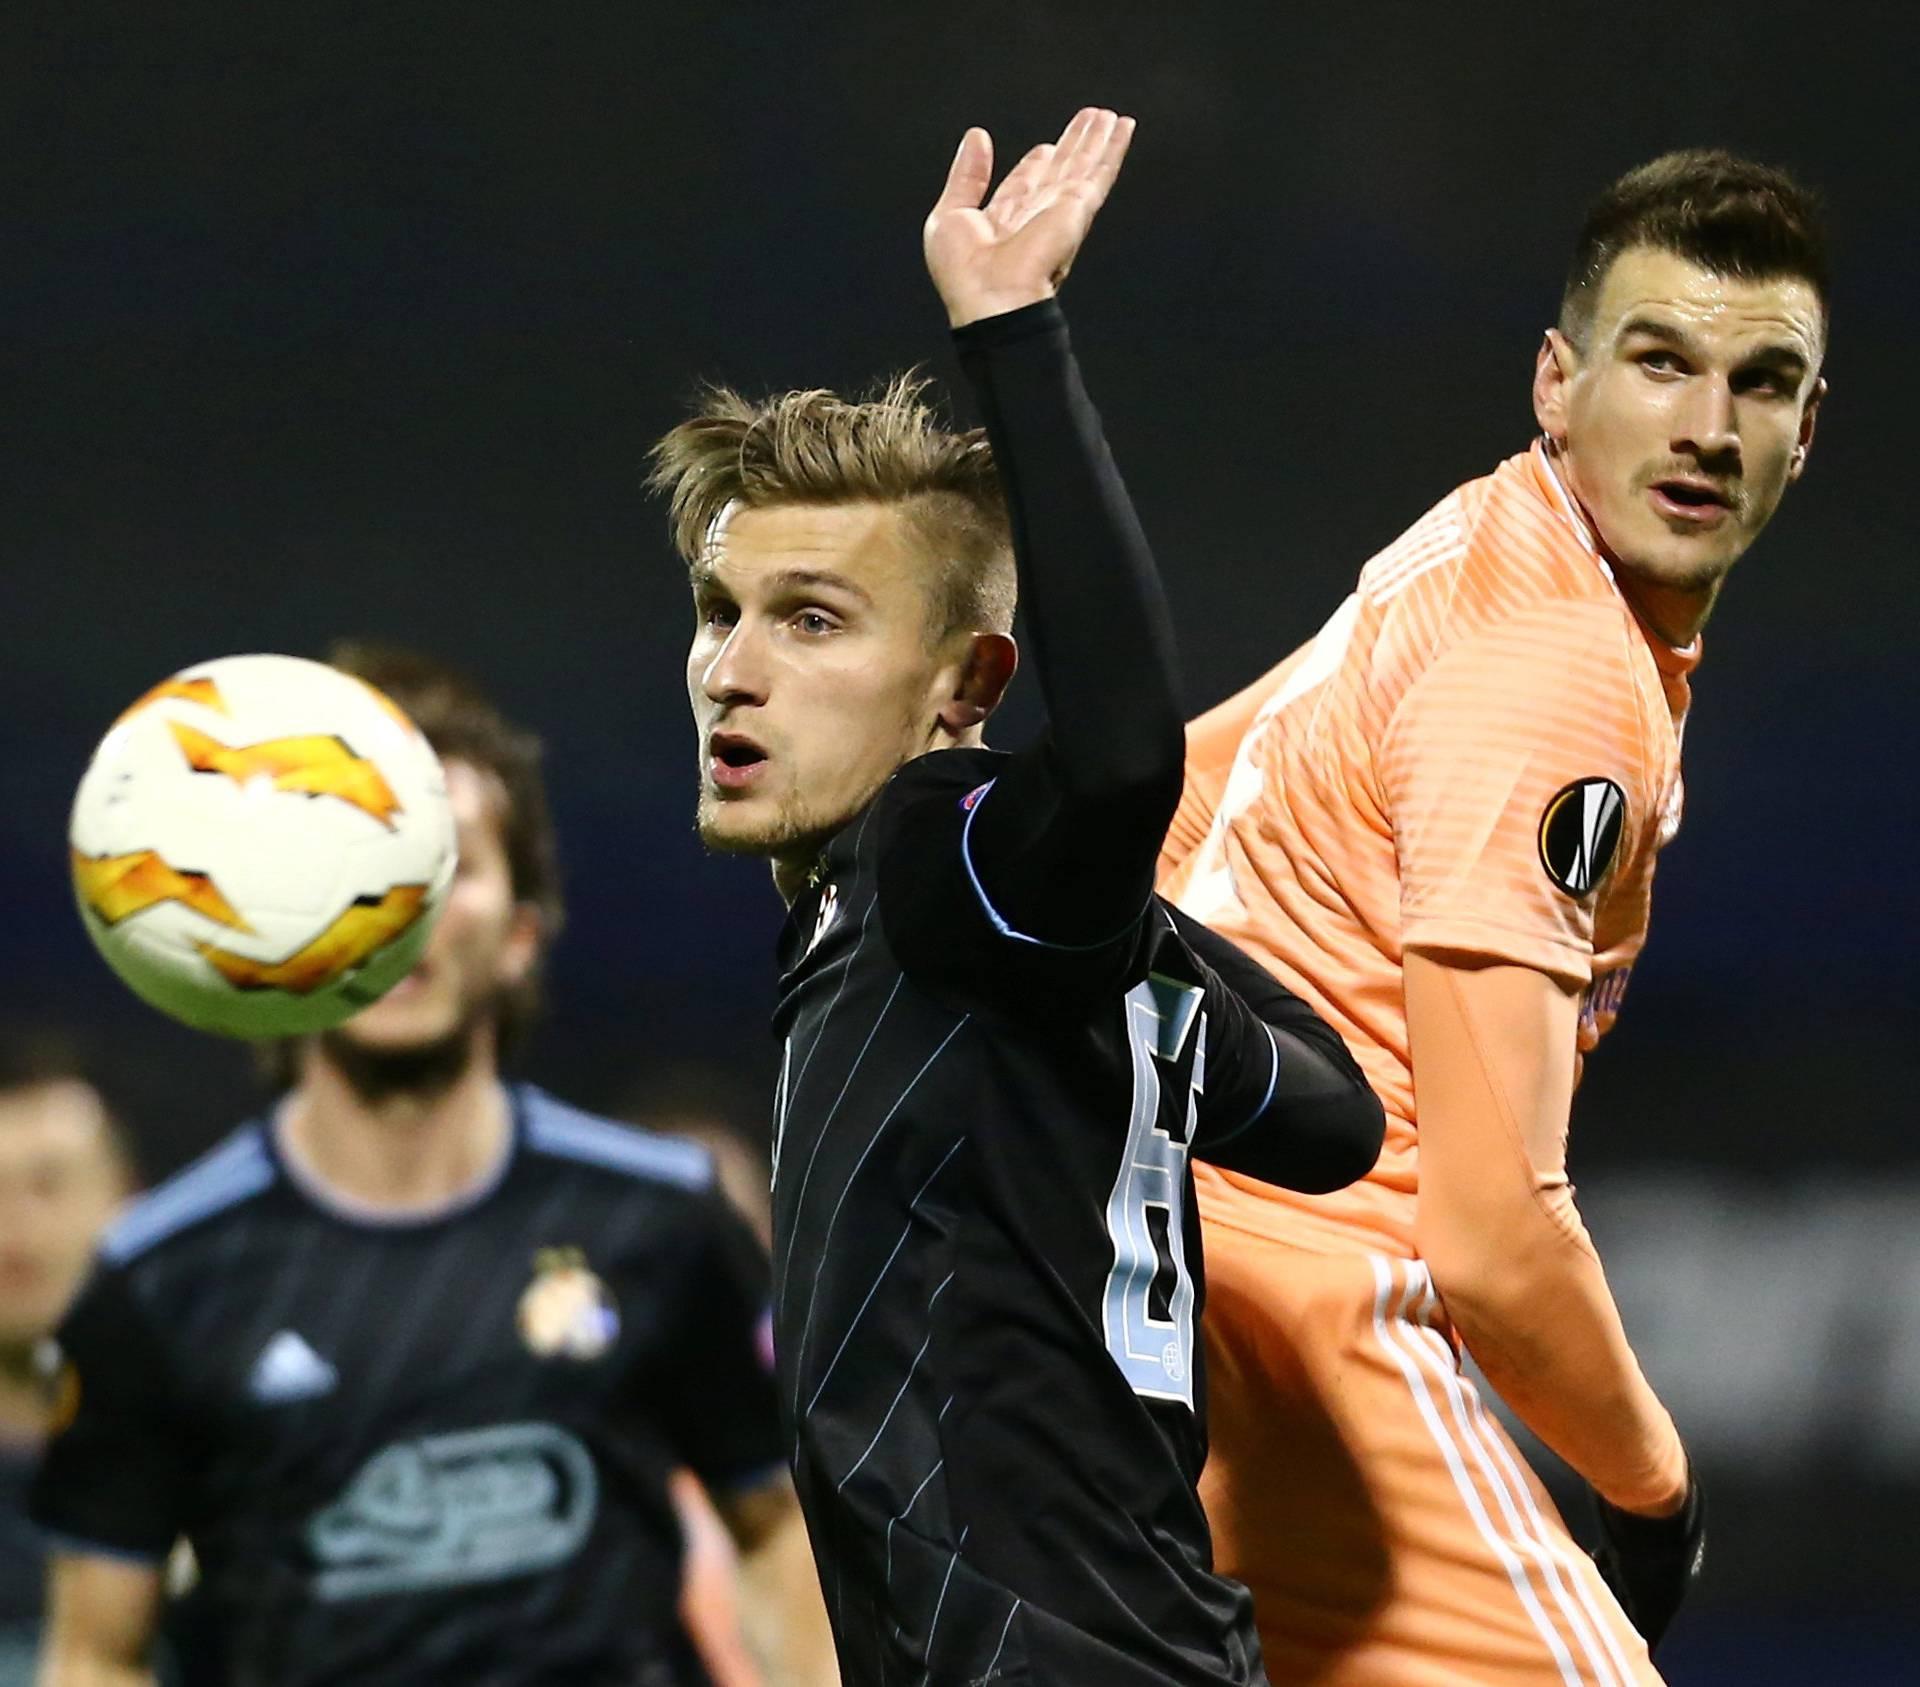 Europa League - Group Stage - Group D - Dinamo Zagreb v RSC Anderlecht